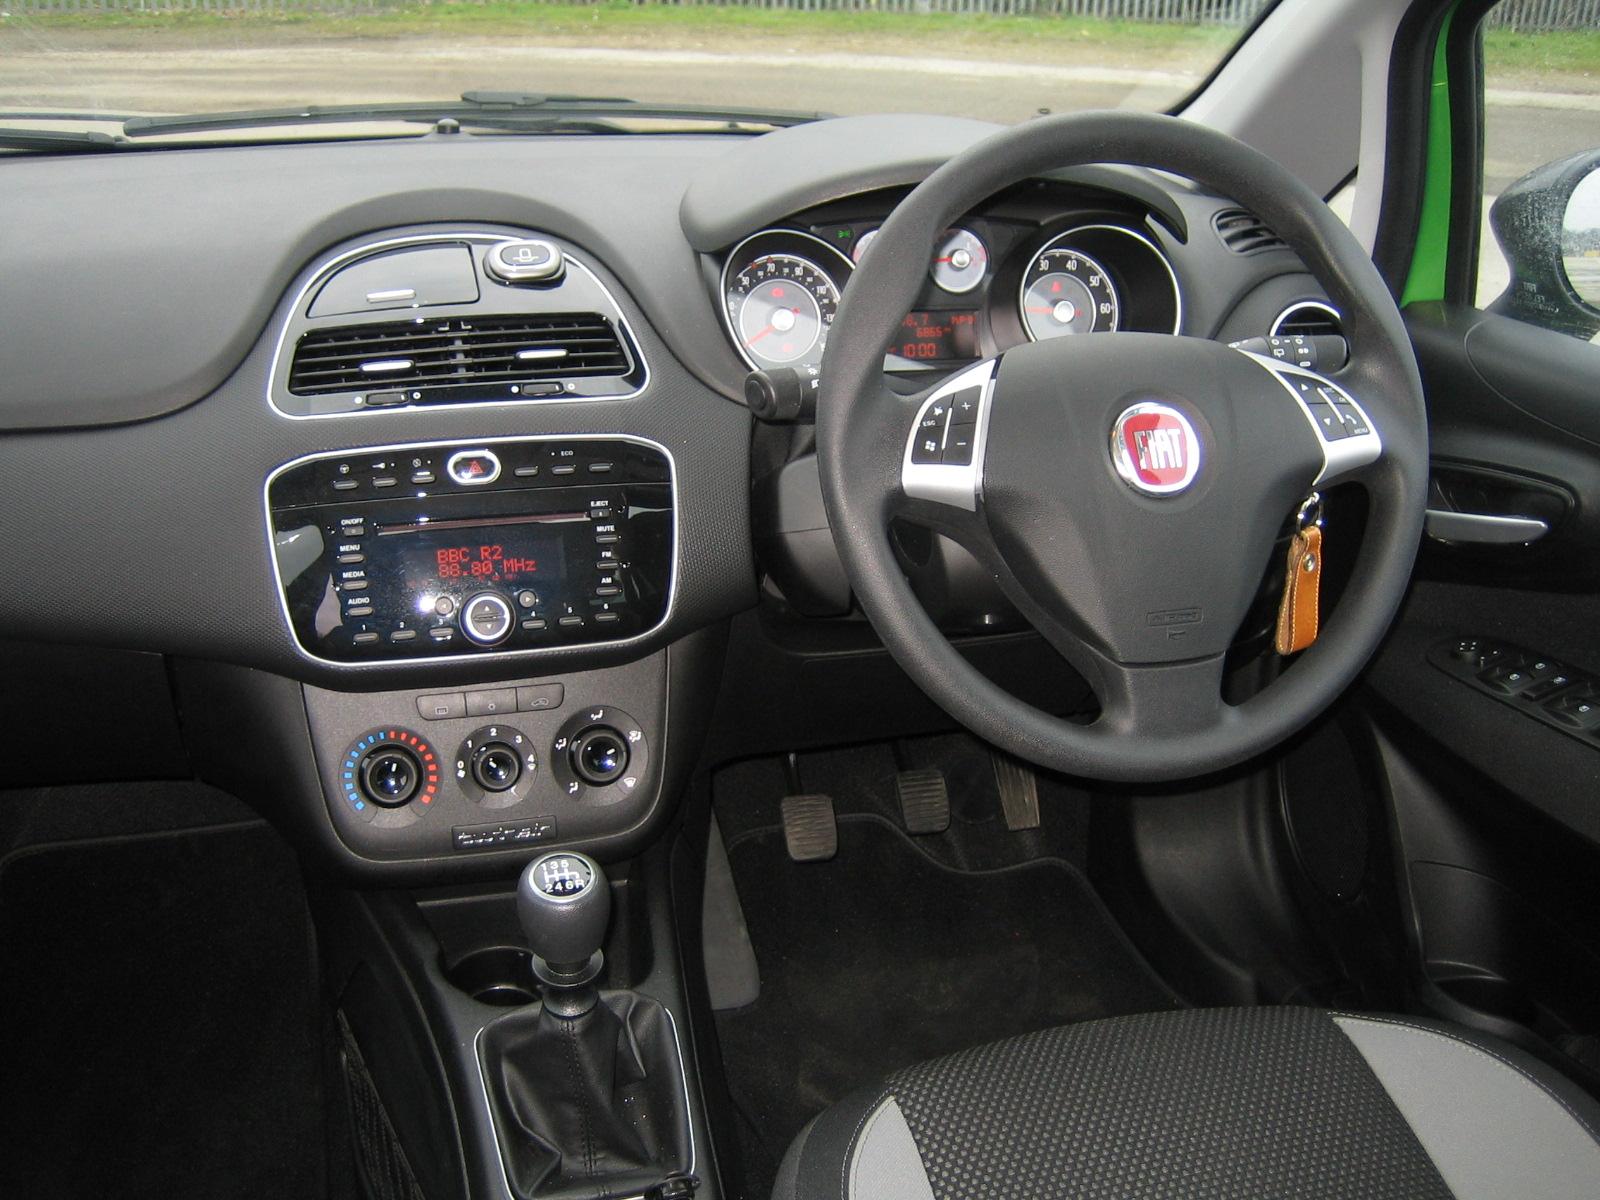 Fiat Punto Twinair on fiat lounge, fiat pop, fiat trekking review, fiat ads,